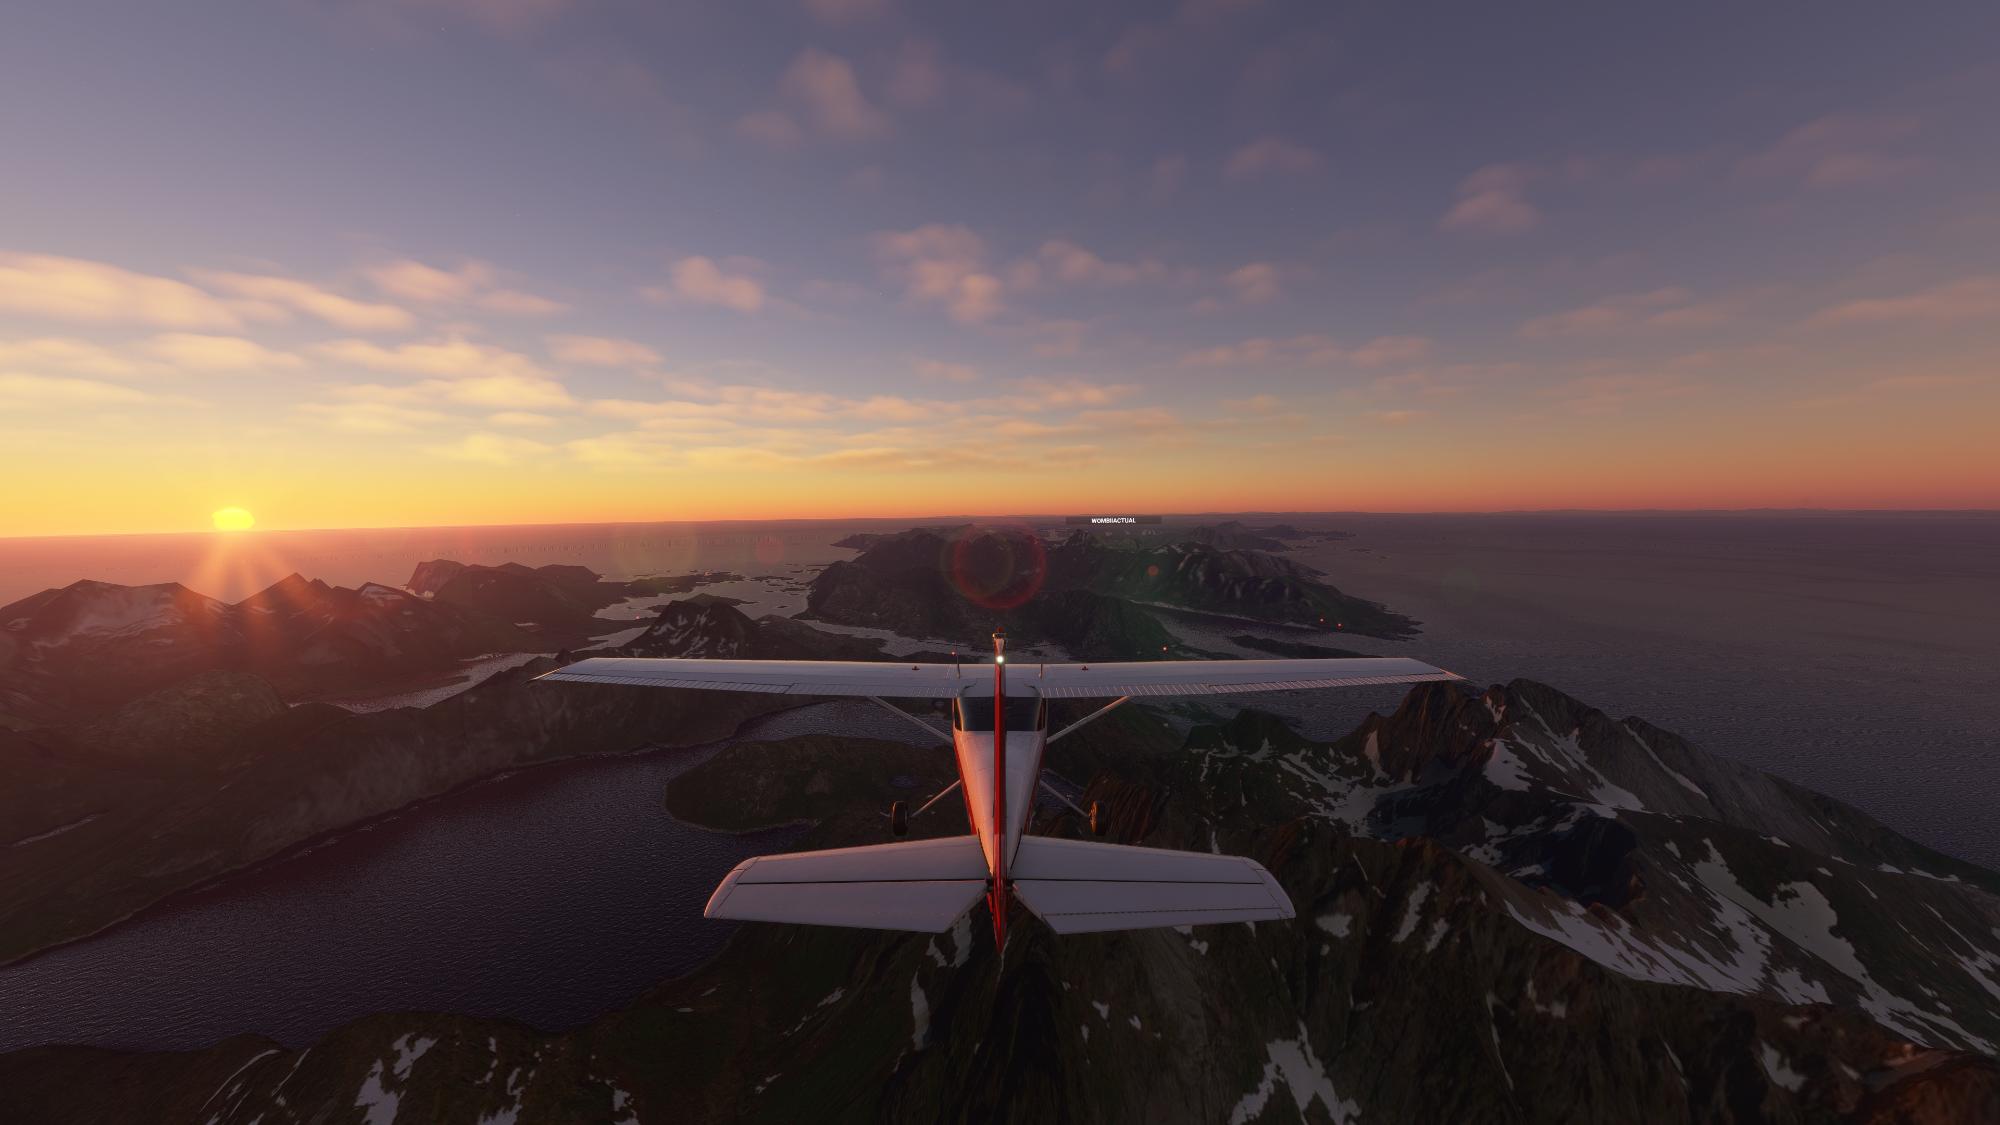 Microsoft Flight Simulator - 1.16.2.0 26.05.2021 00_16_55.png